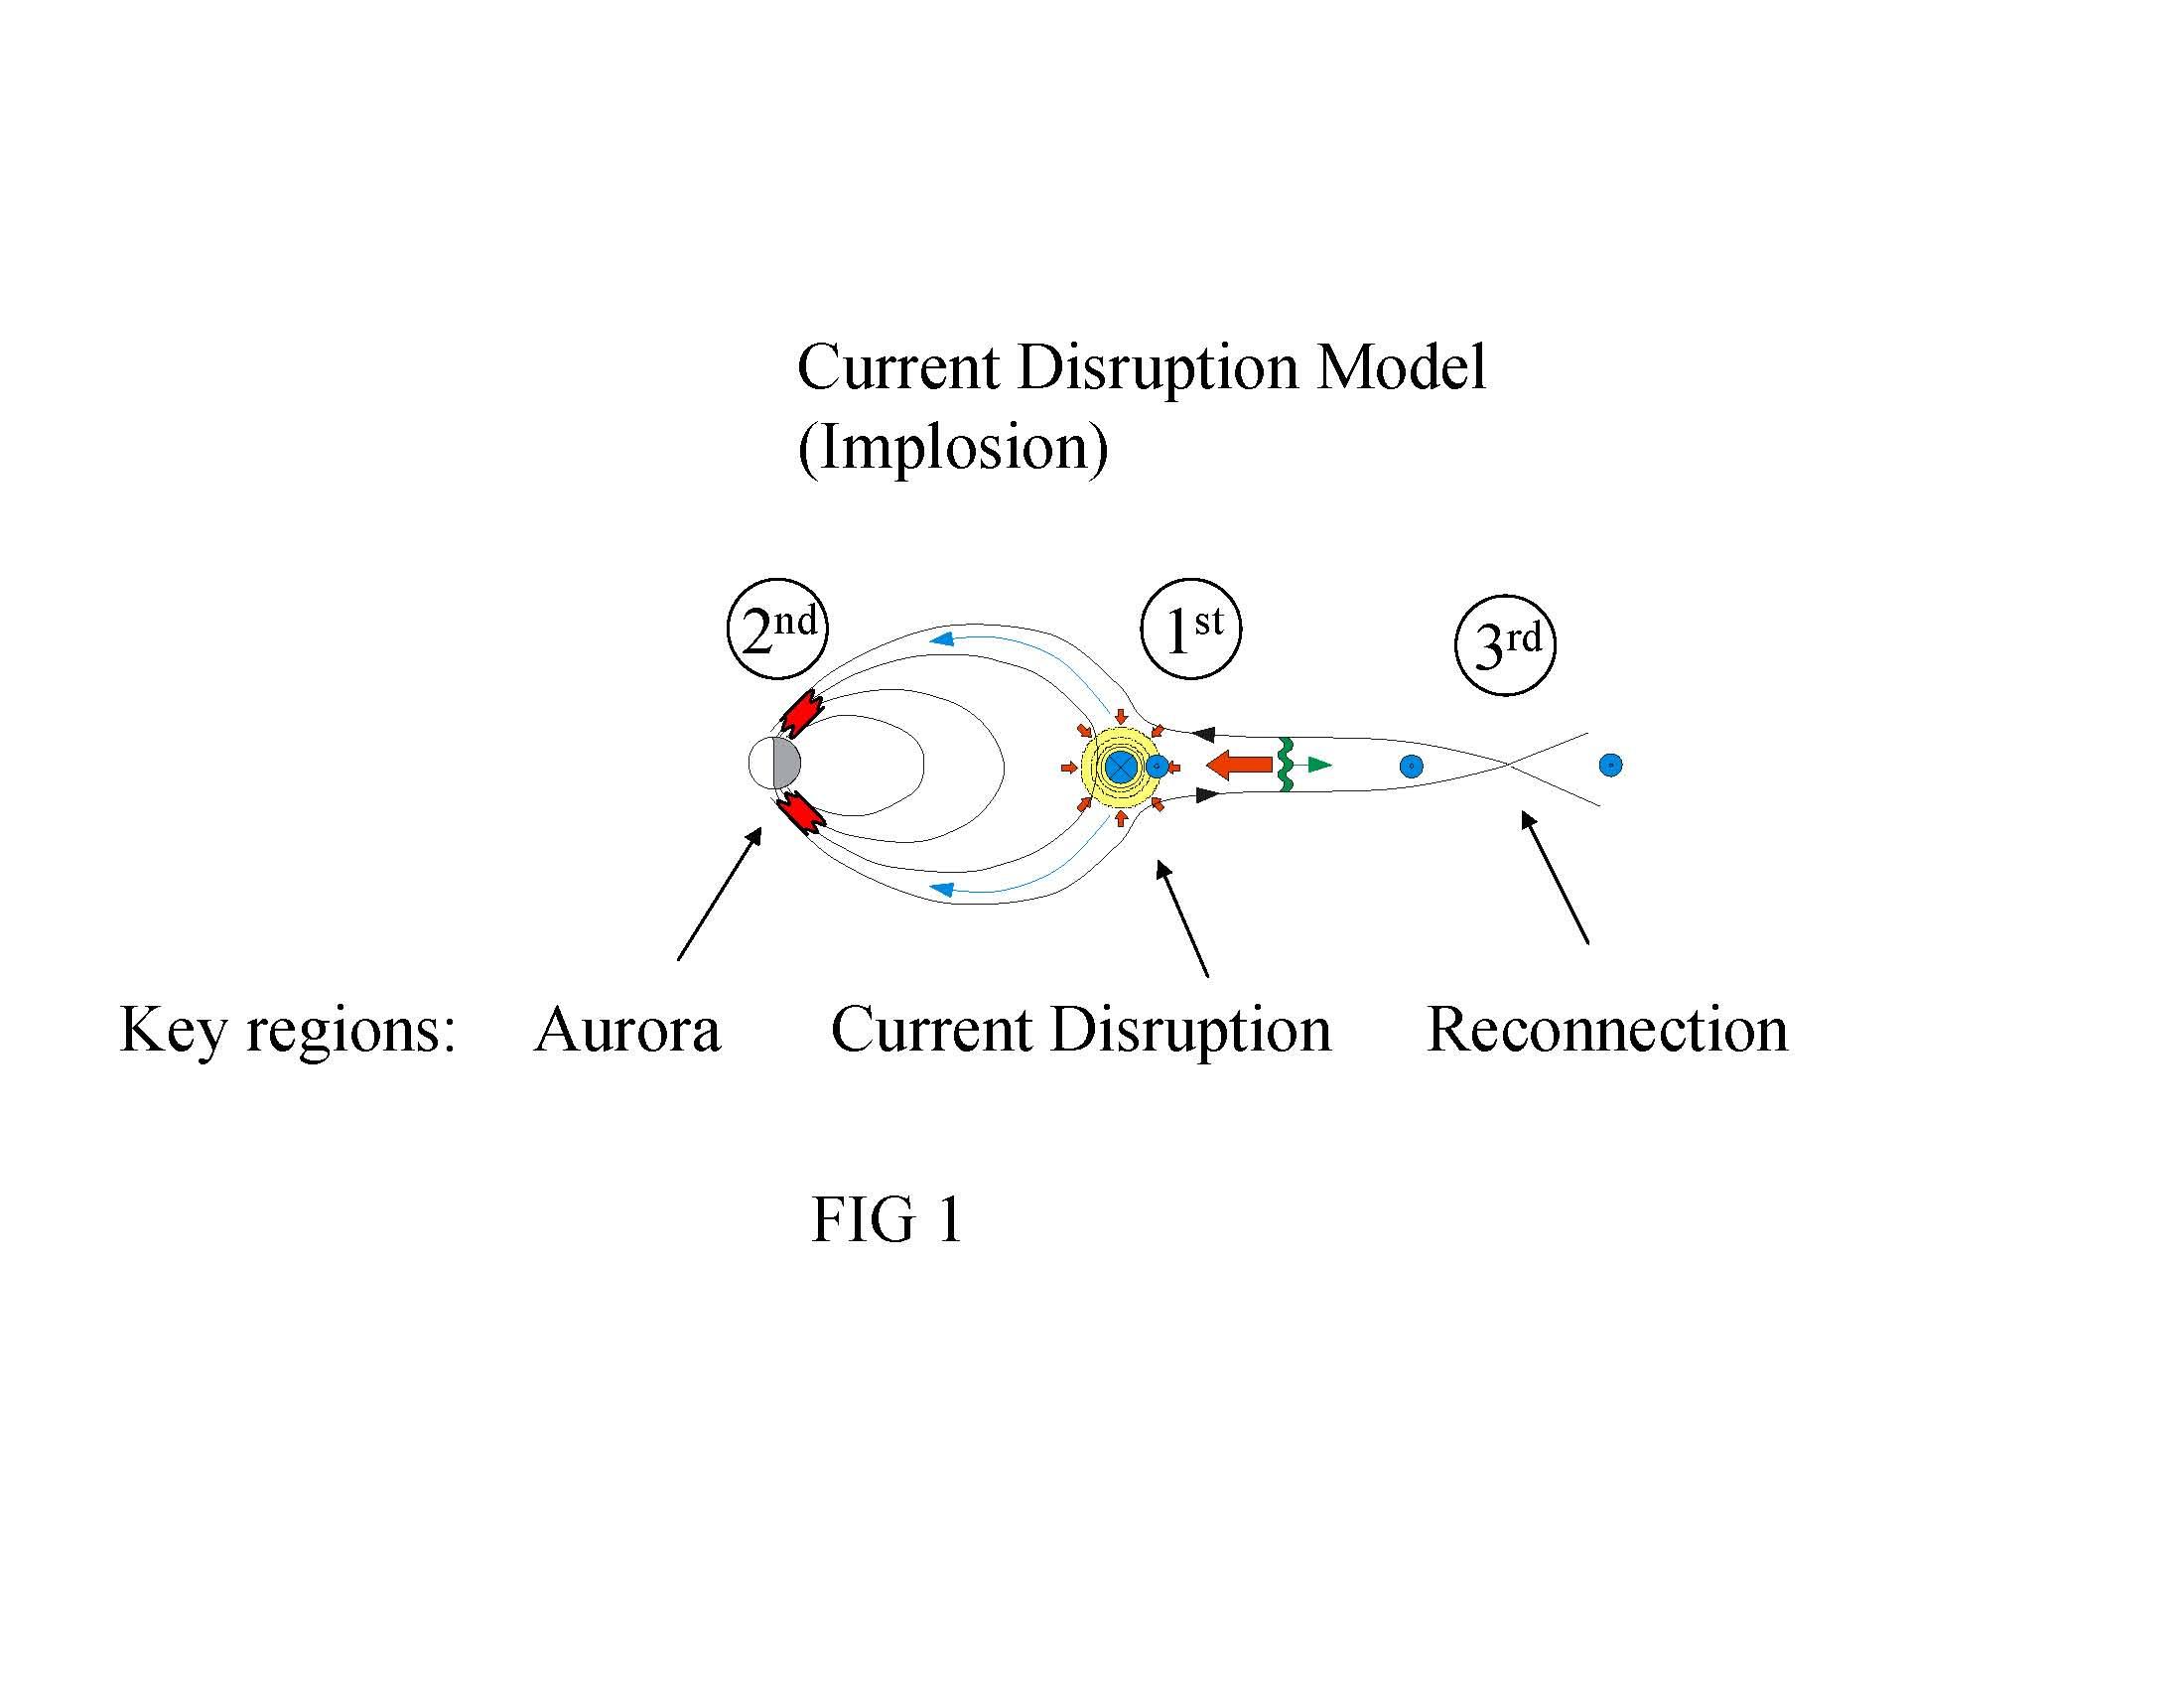 The Current Disruption model of a substorm